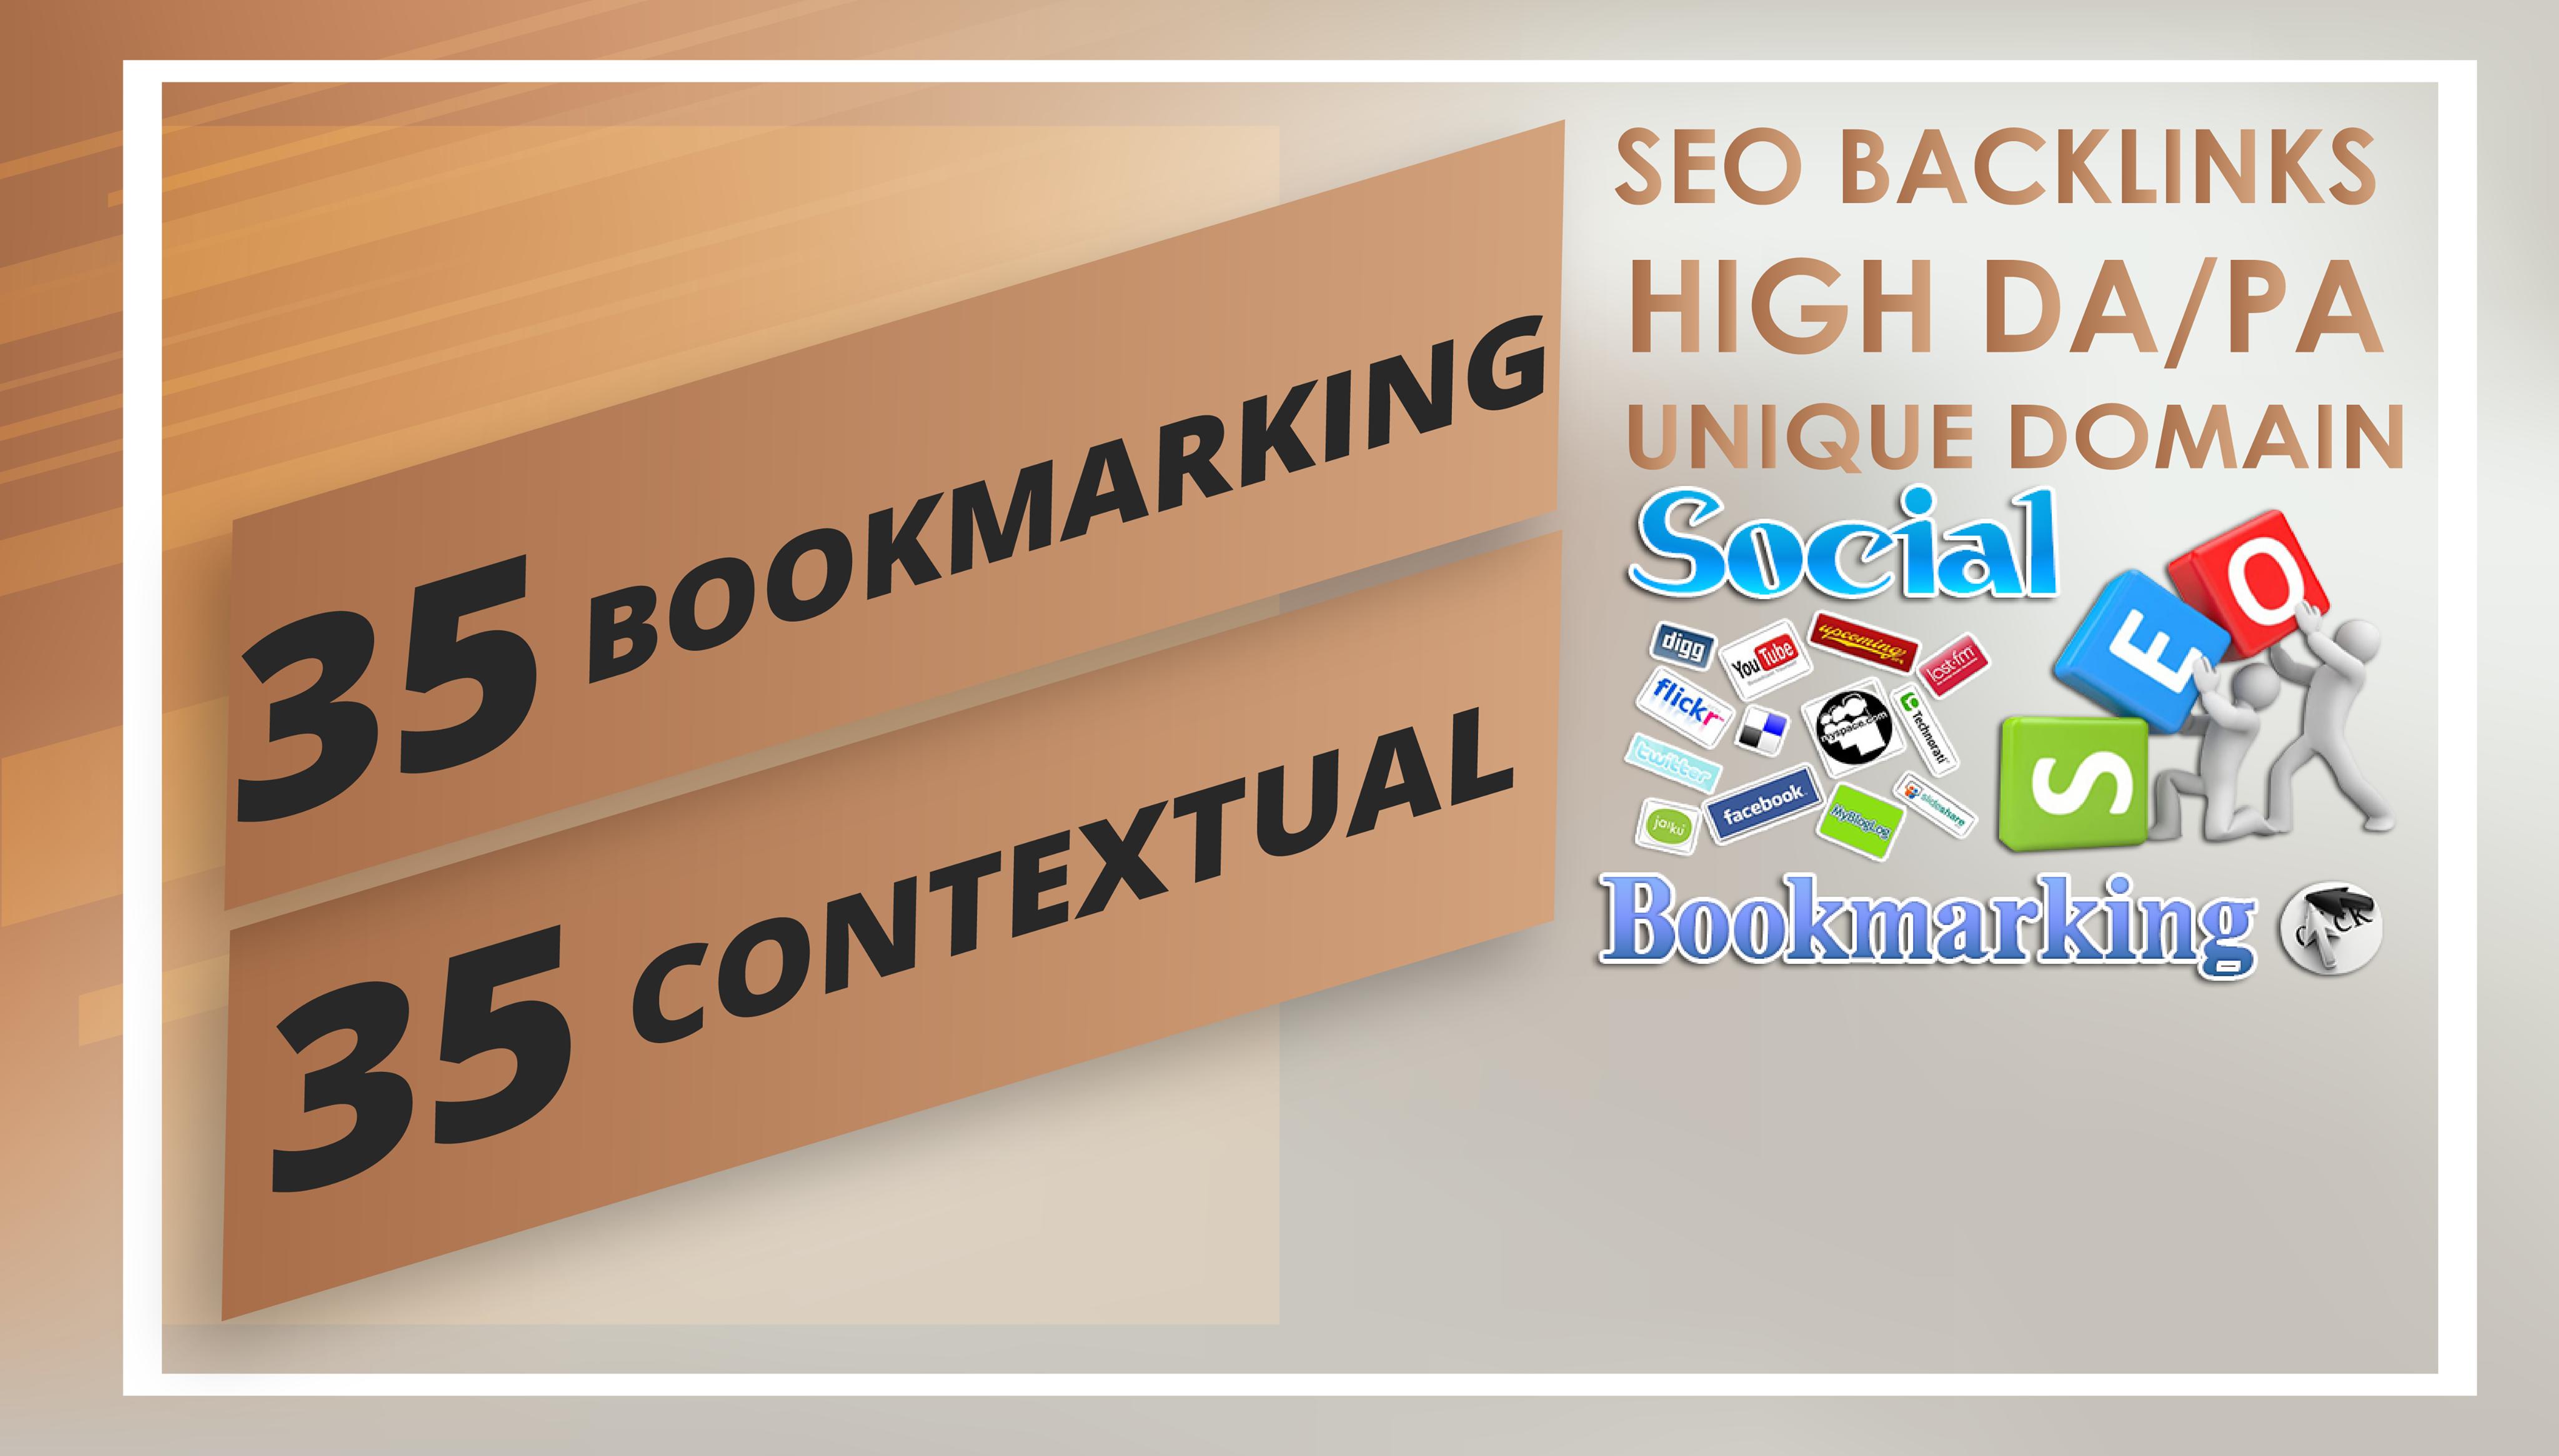 Build Seo Backlinks 35 Contextual + 35 SOCIAL Bookmak...